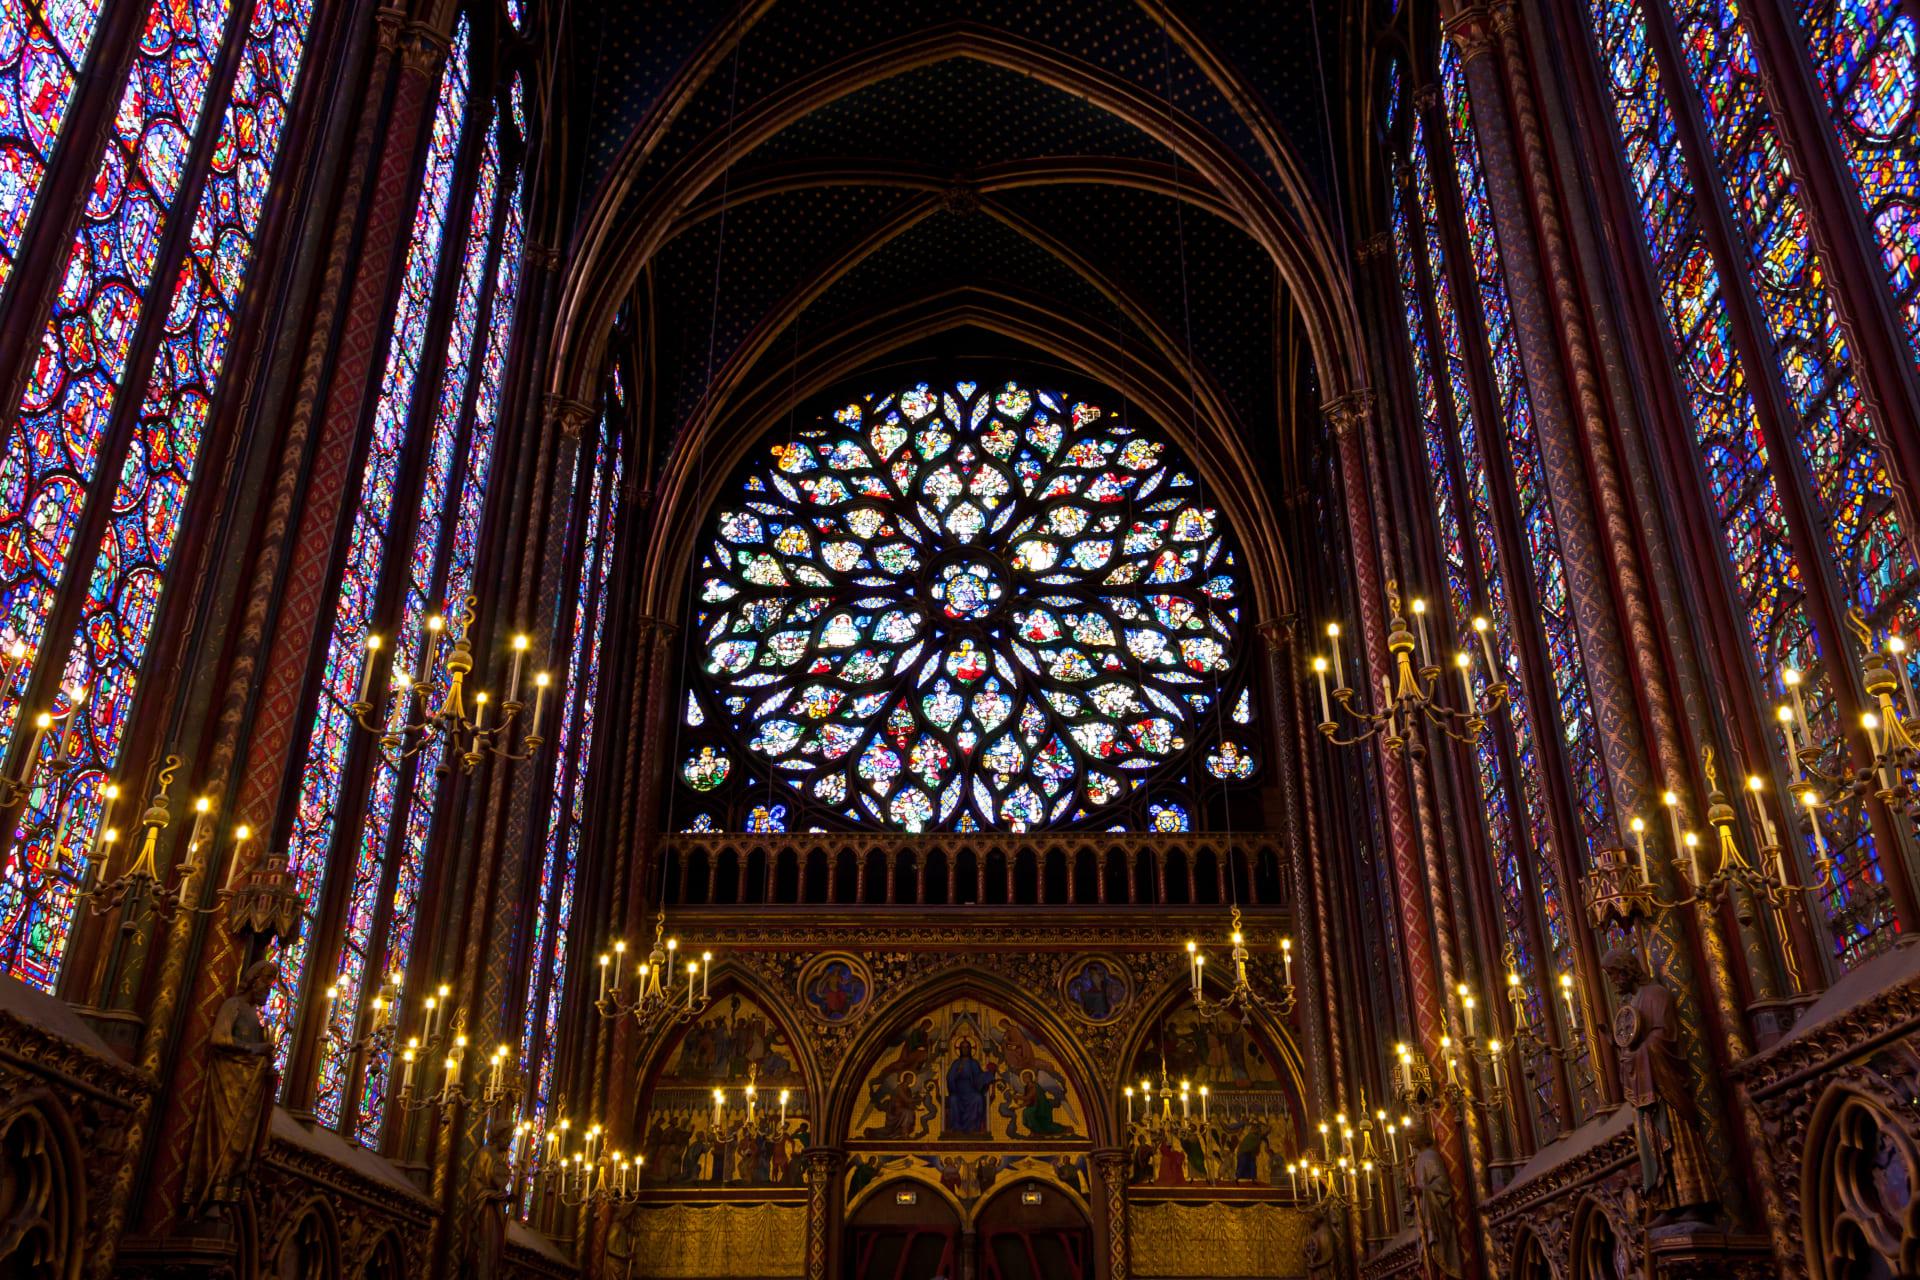 Paris - 10  Most Incredible Churches in Paris:   N°1 Sainte Chapelle